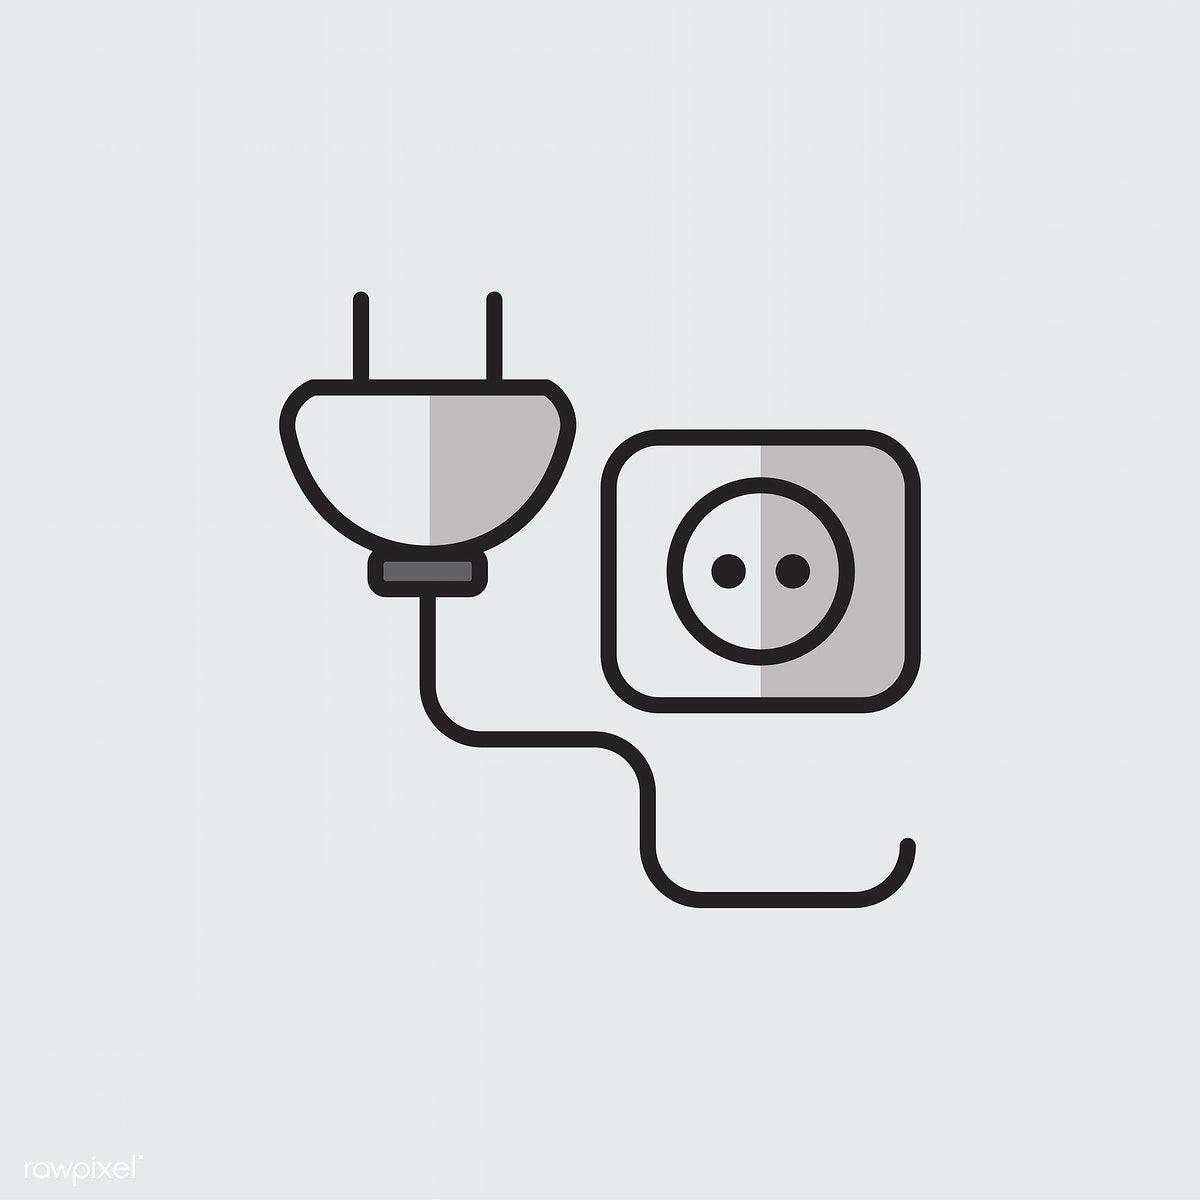 Illustration Of Power Plug And Socket